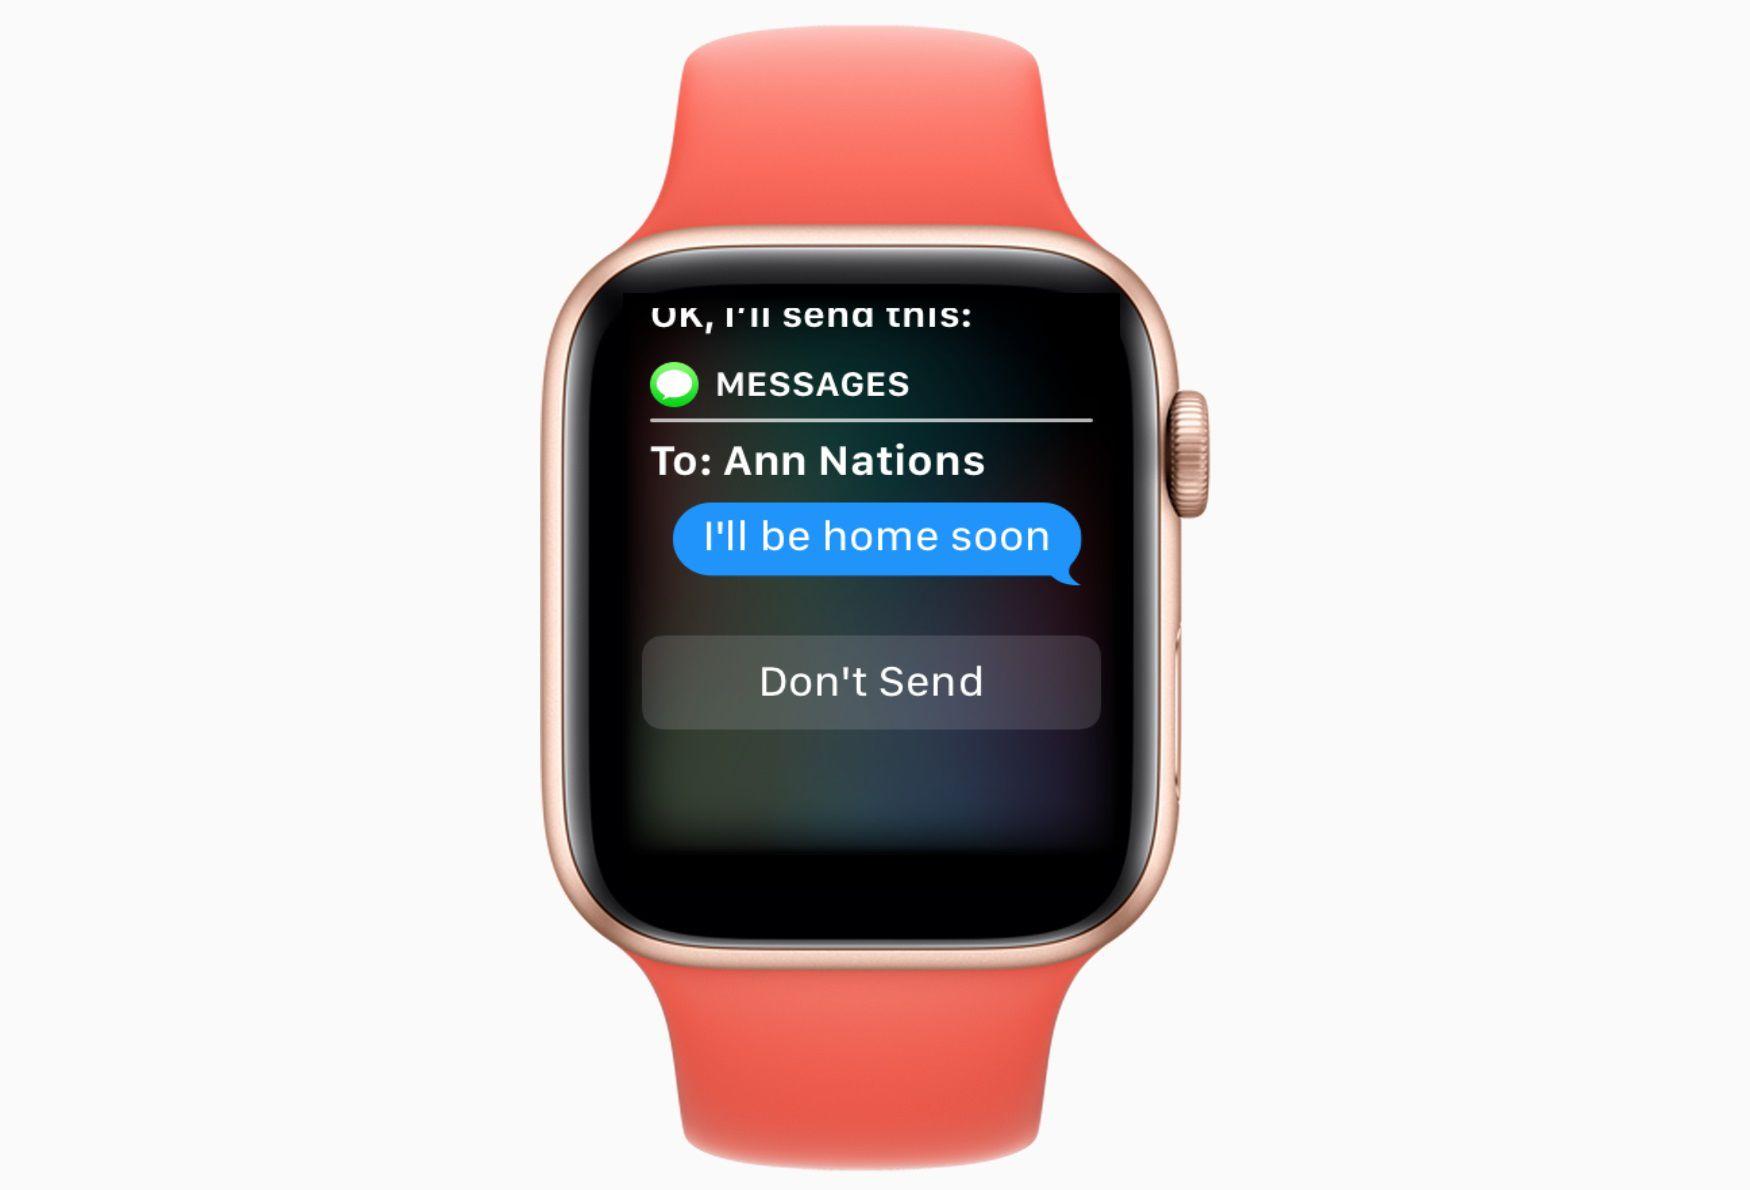 An Apple watch with Siri sending a text message.